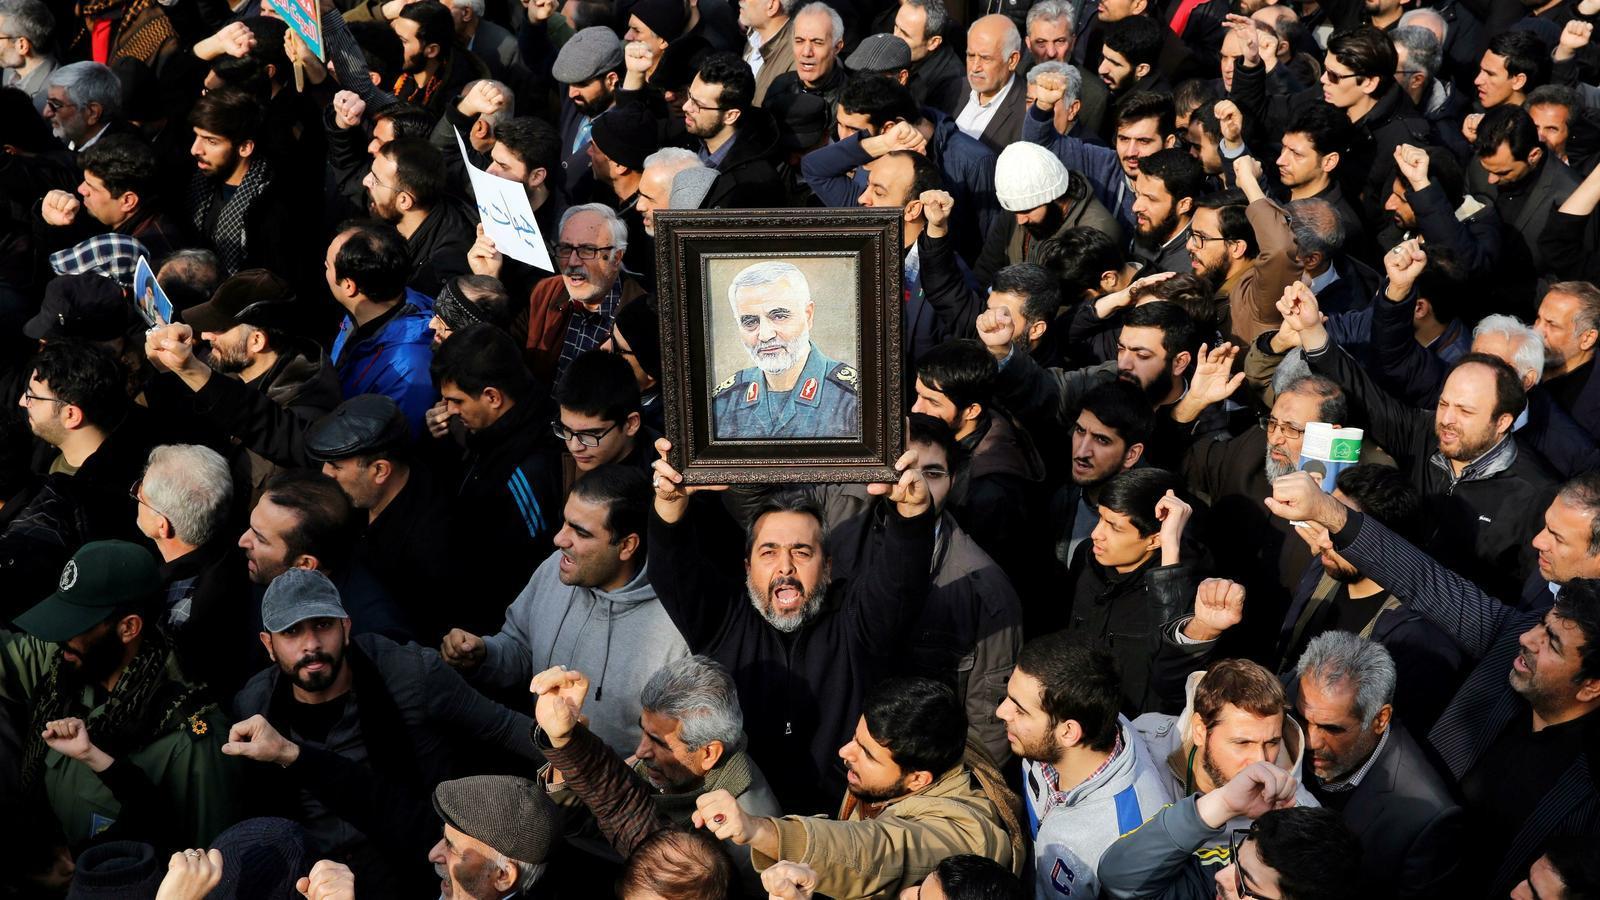 L'Iran promet venjança per l'atac nord-americà